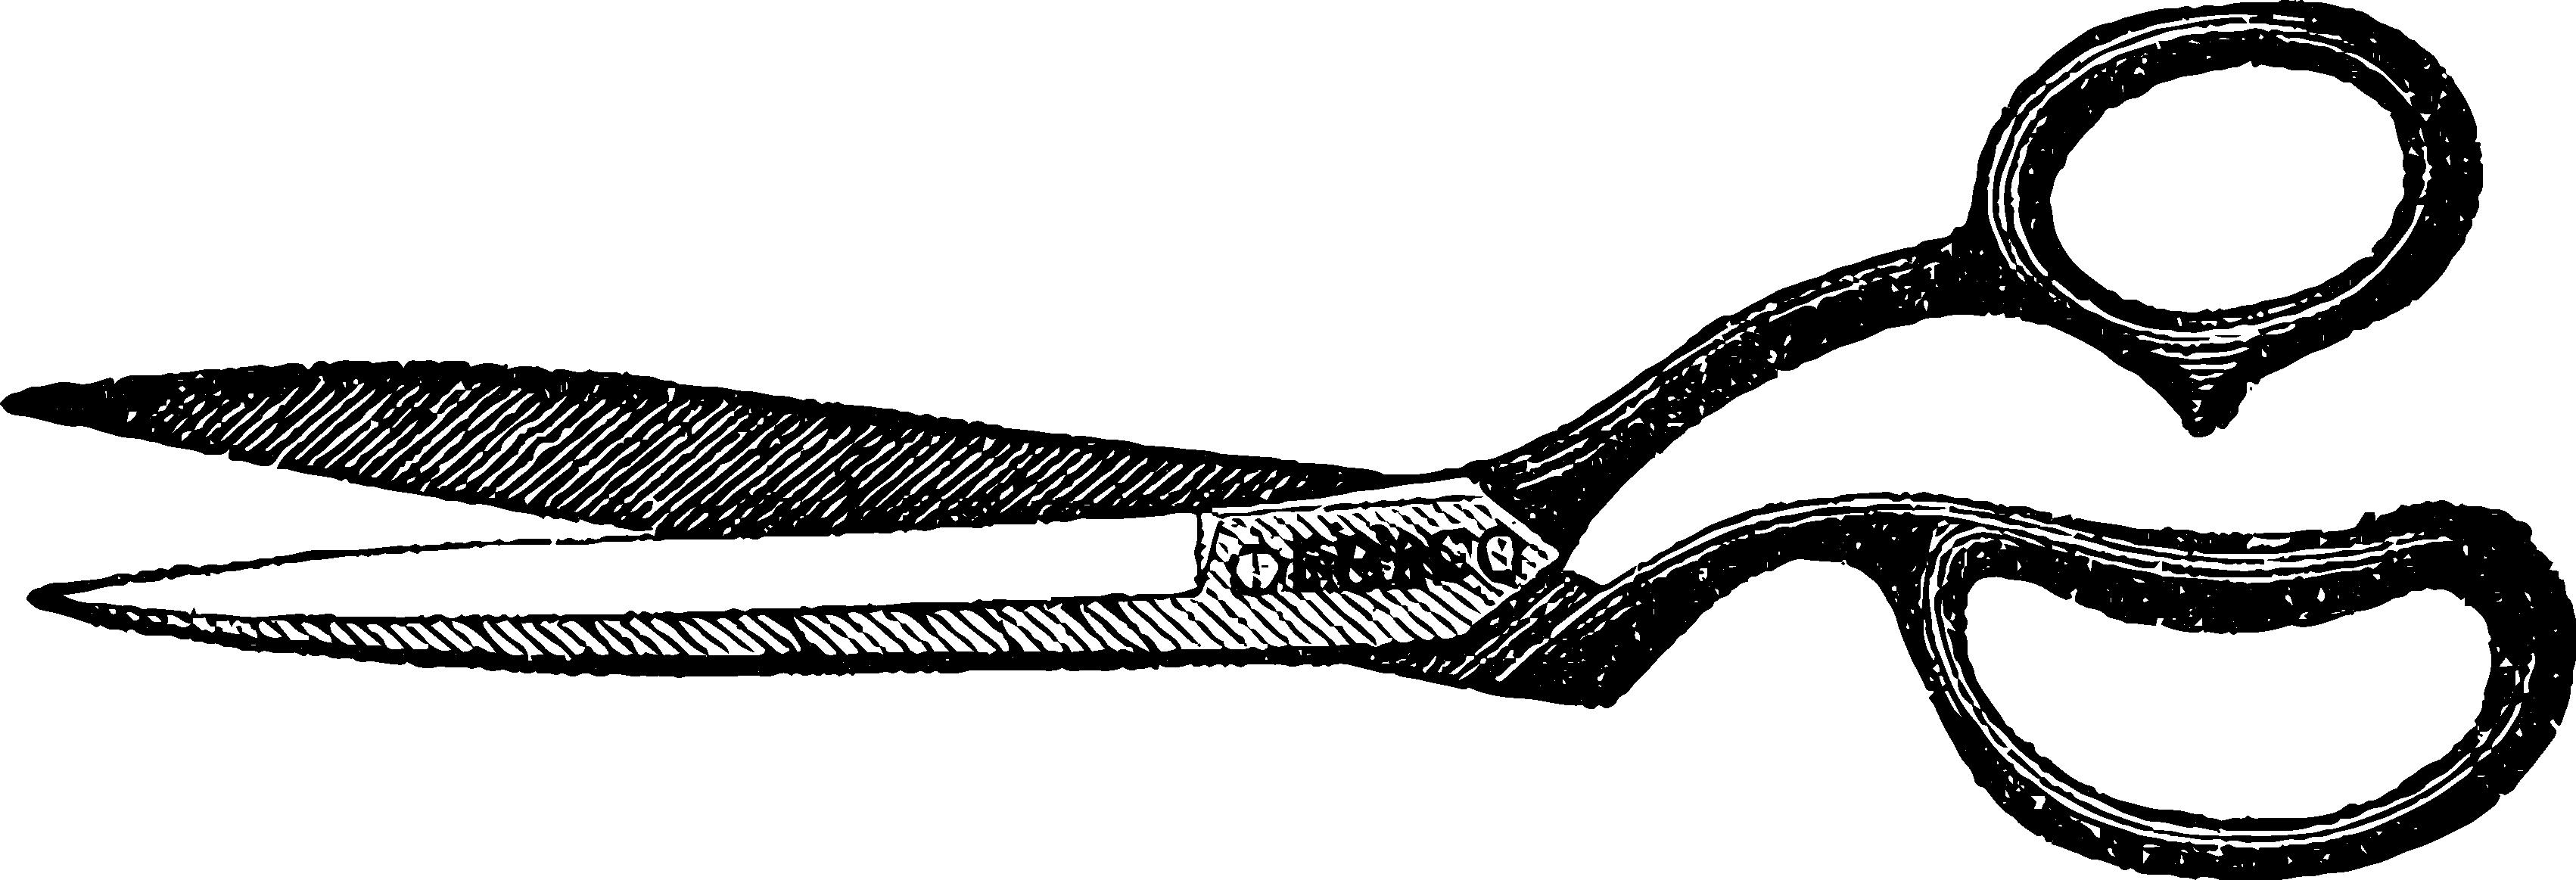 scissors orizontal